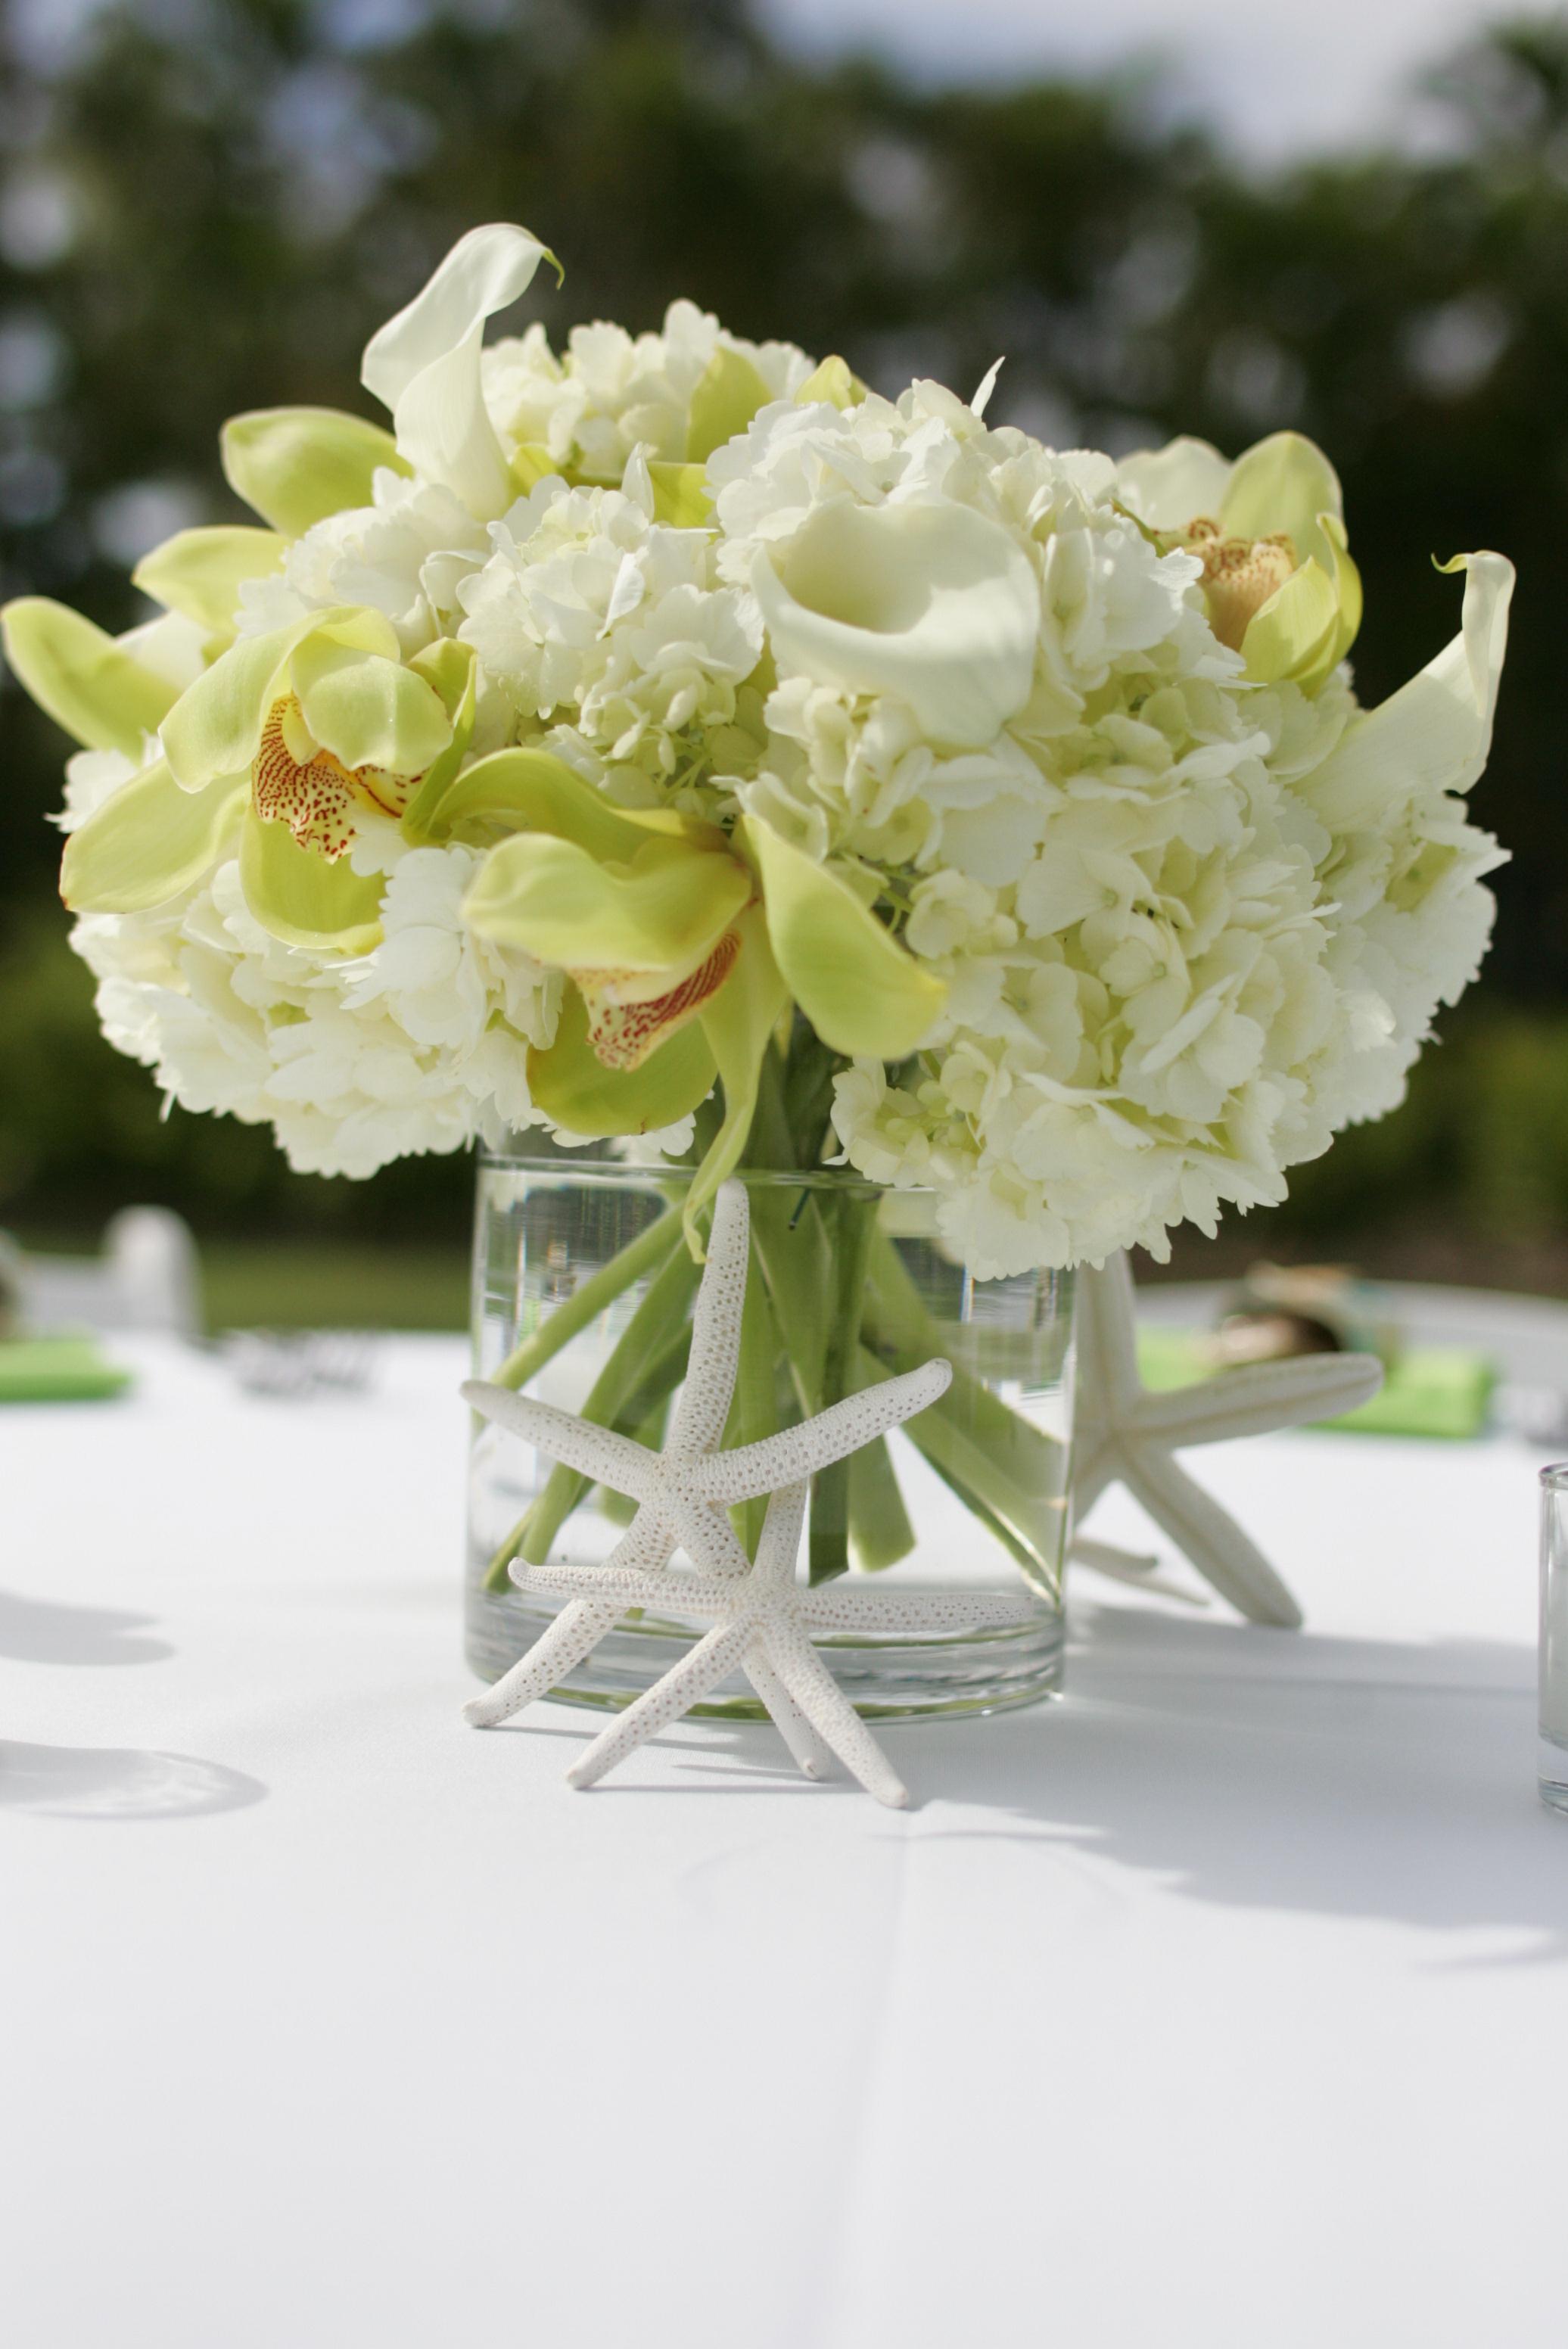 Flowers & Decor, white, green, Centerpieces, Flowers, Centerpiece